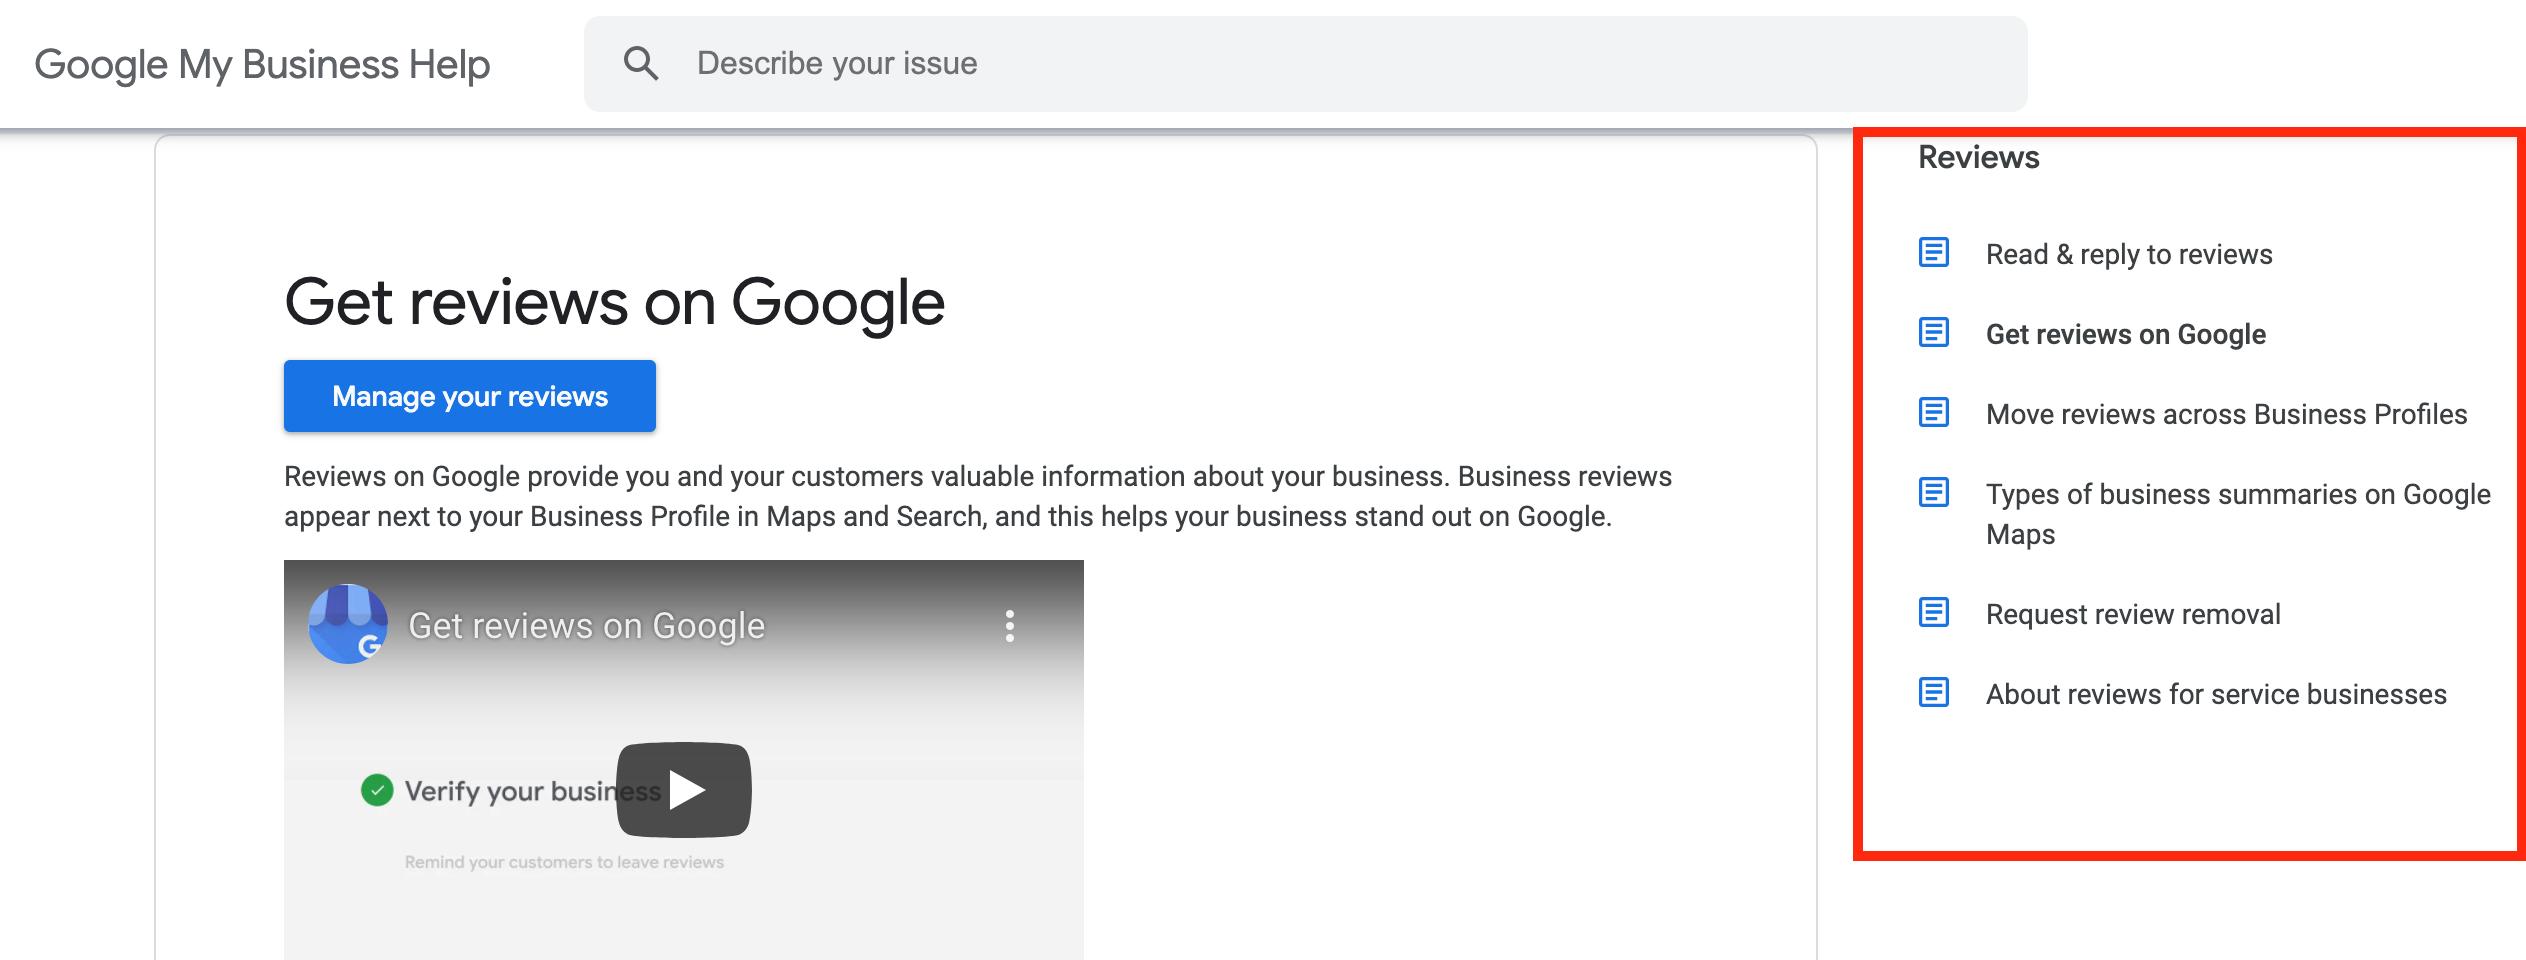 Google My Business profil sahipleri